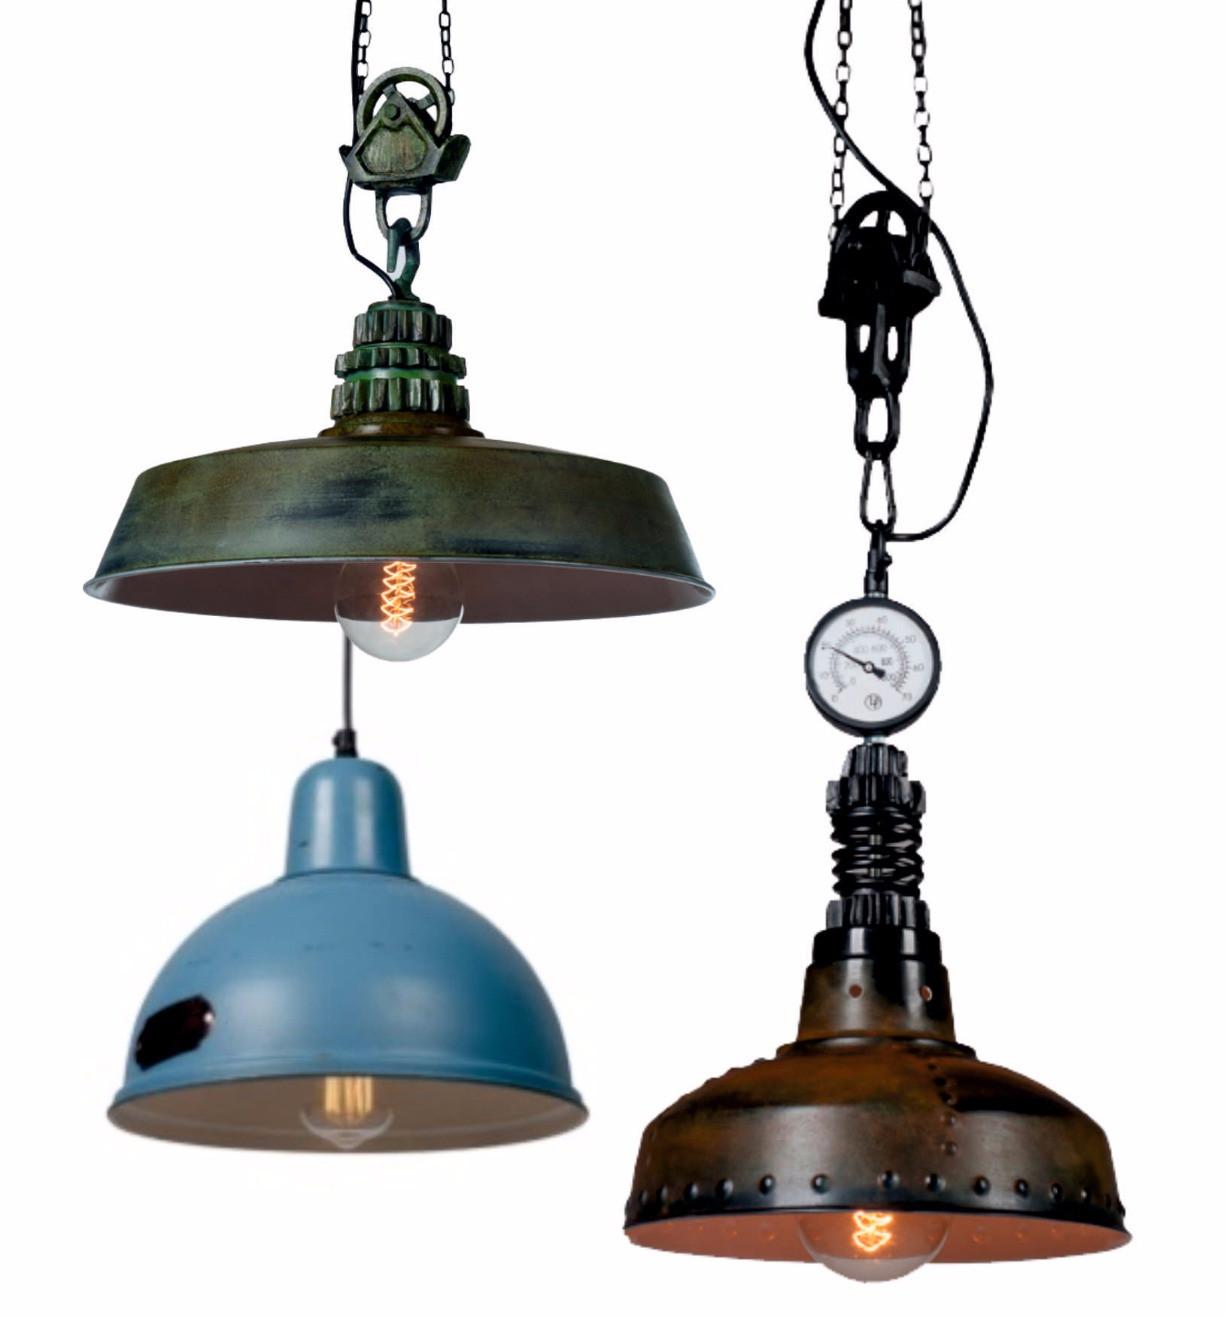 Fabriquer Une Lampe Style Industriel lampe style industriel